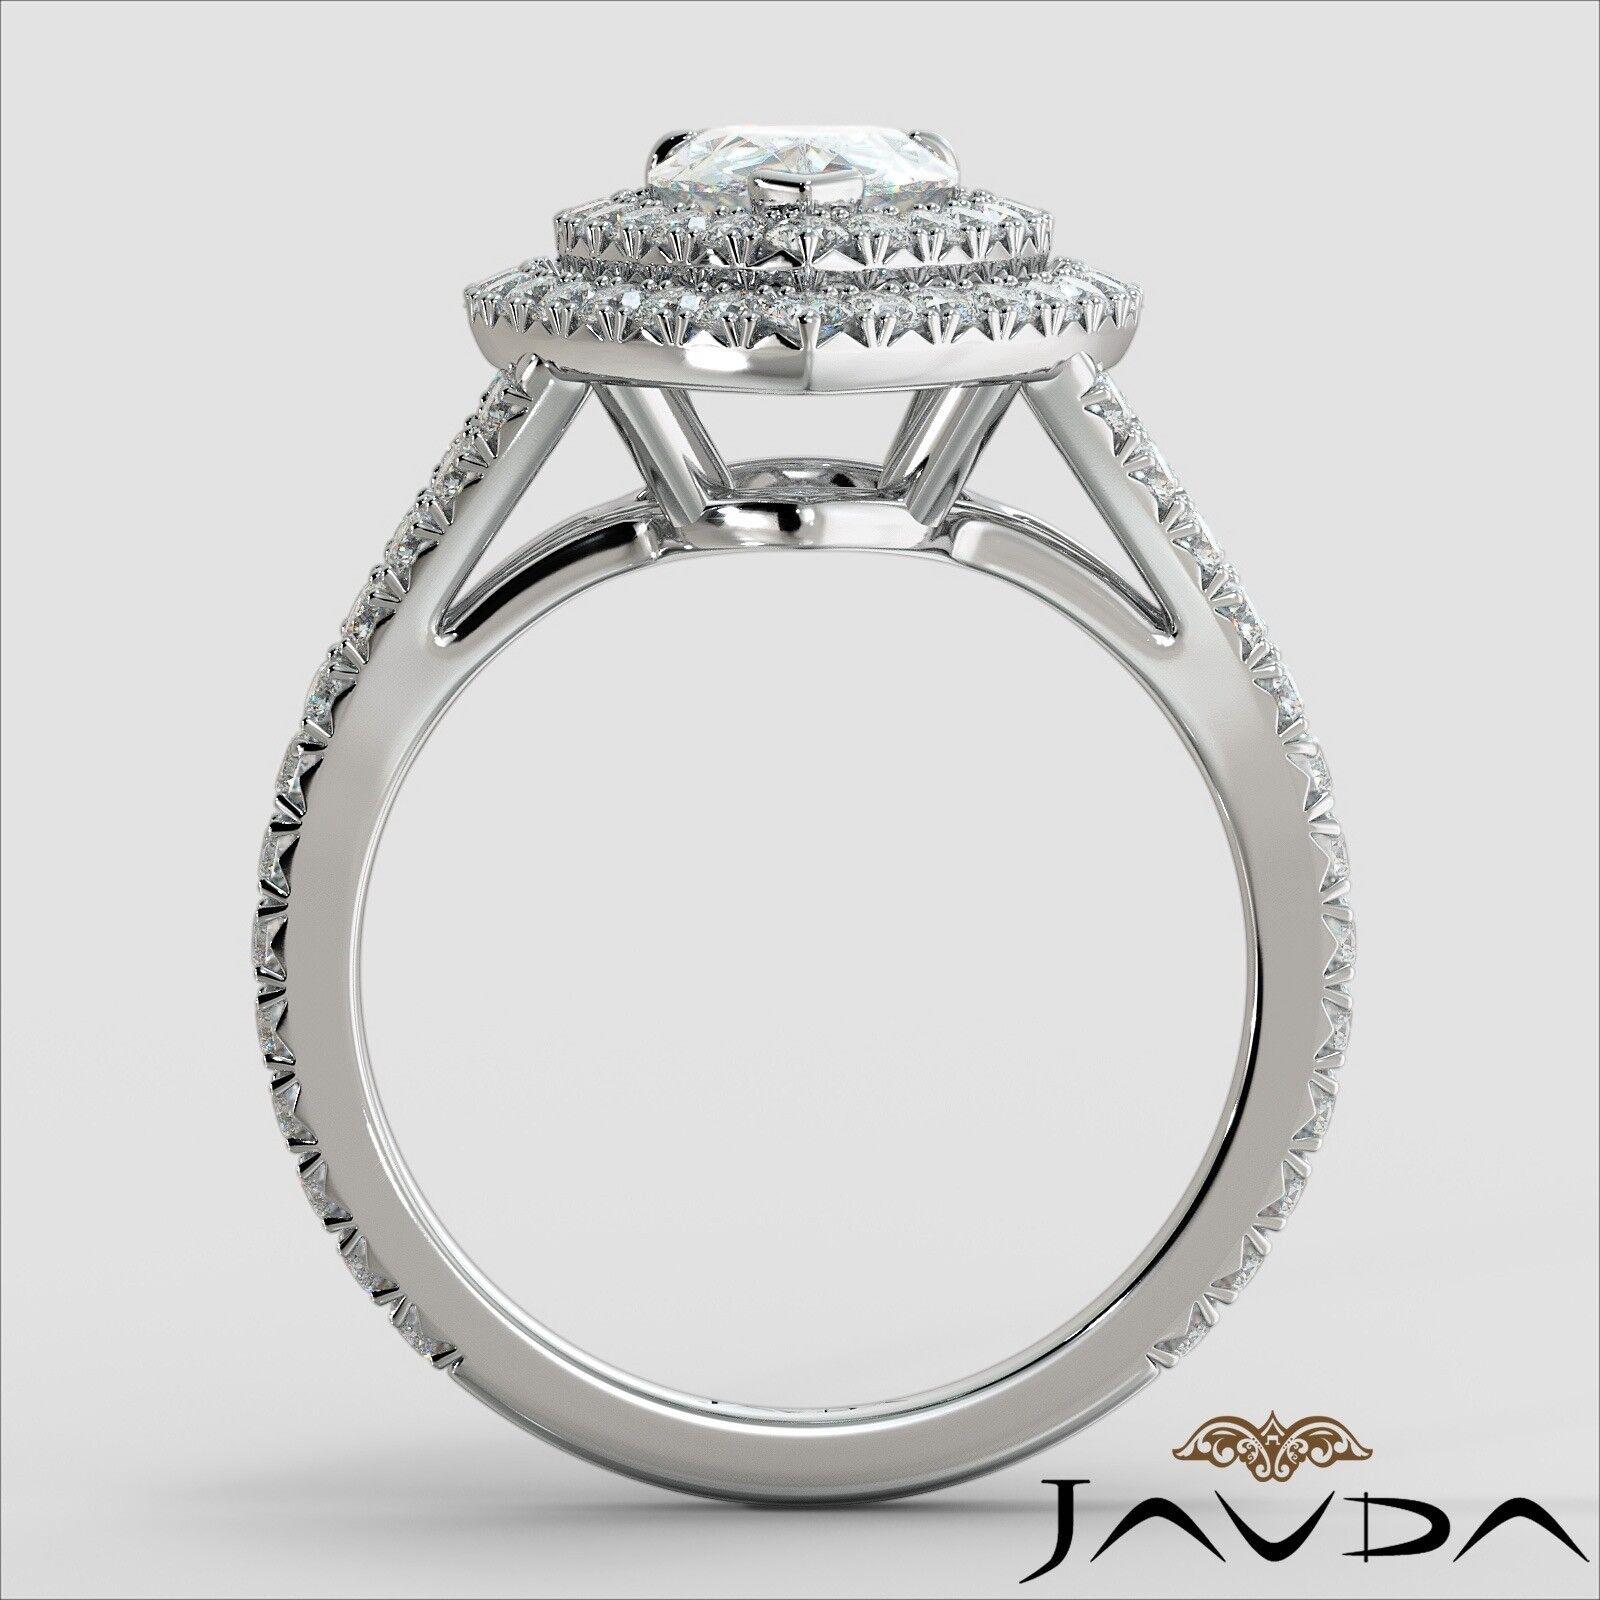 2.12ct Double Halo Split Shank Pear Diamond Engagement Ring GIA E-SI1 White Gold 3